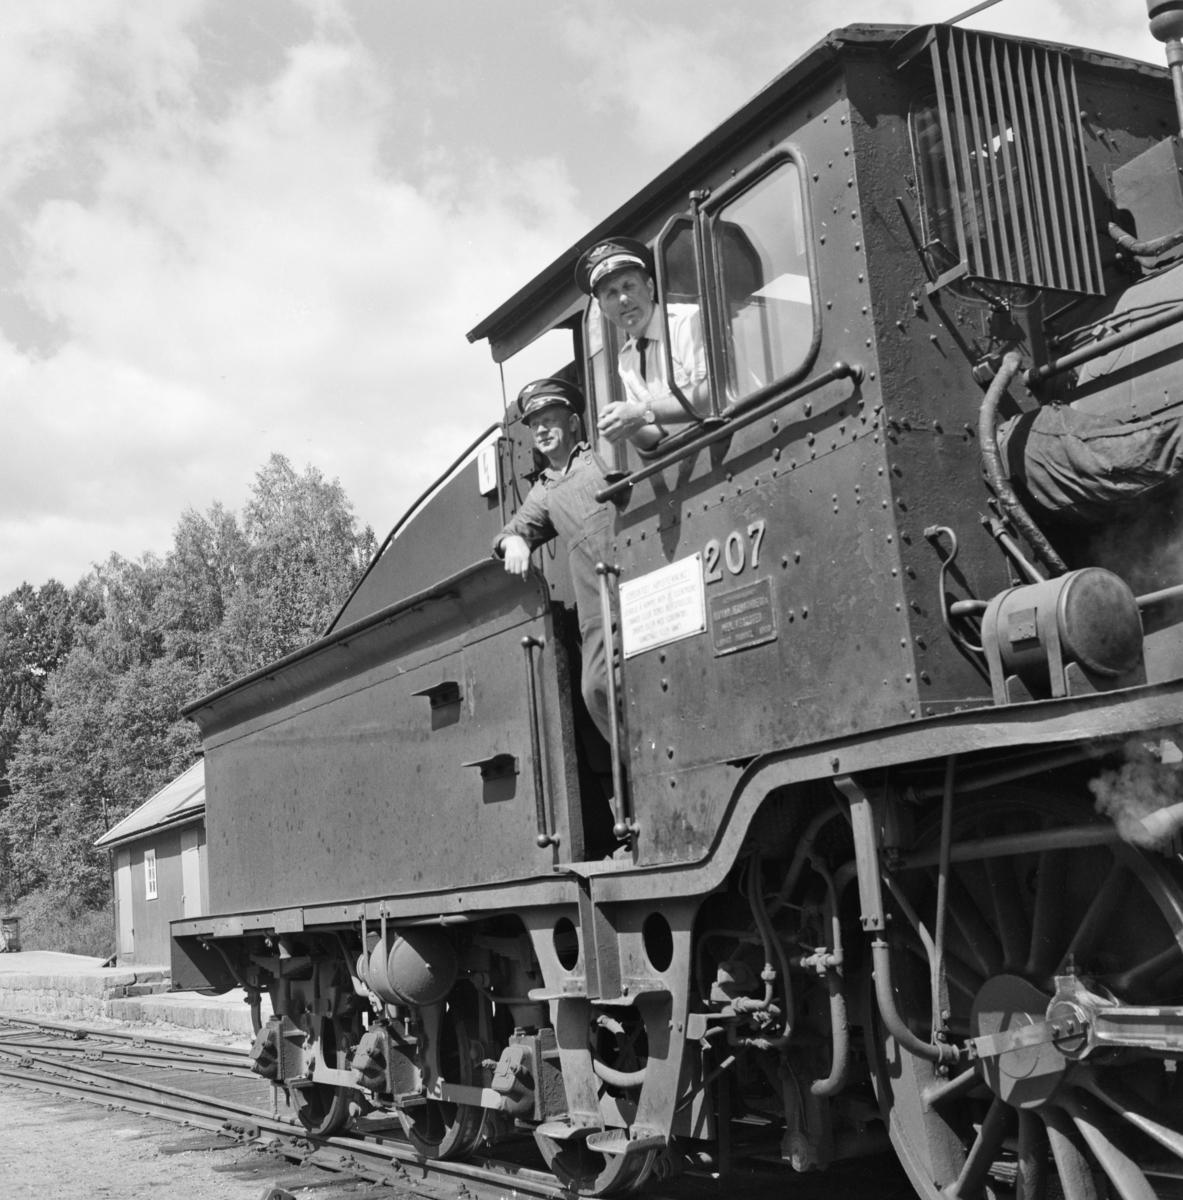 Lokomotivpersonalet på damplokomotiv 21e nr. 207 i godstog 5387 på Numedalsbanen.